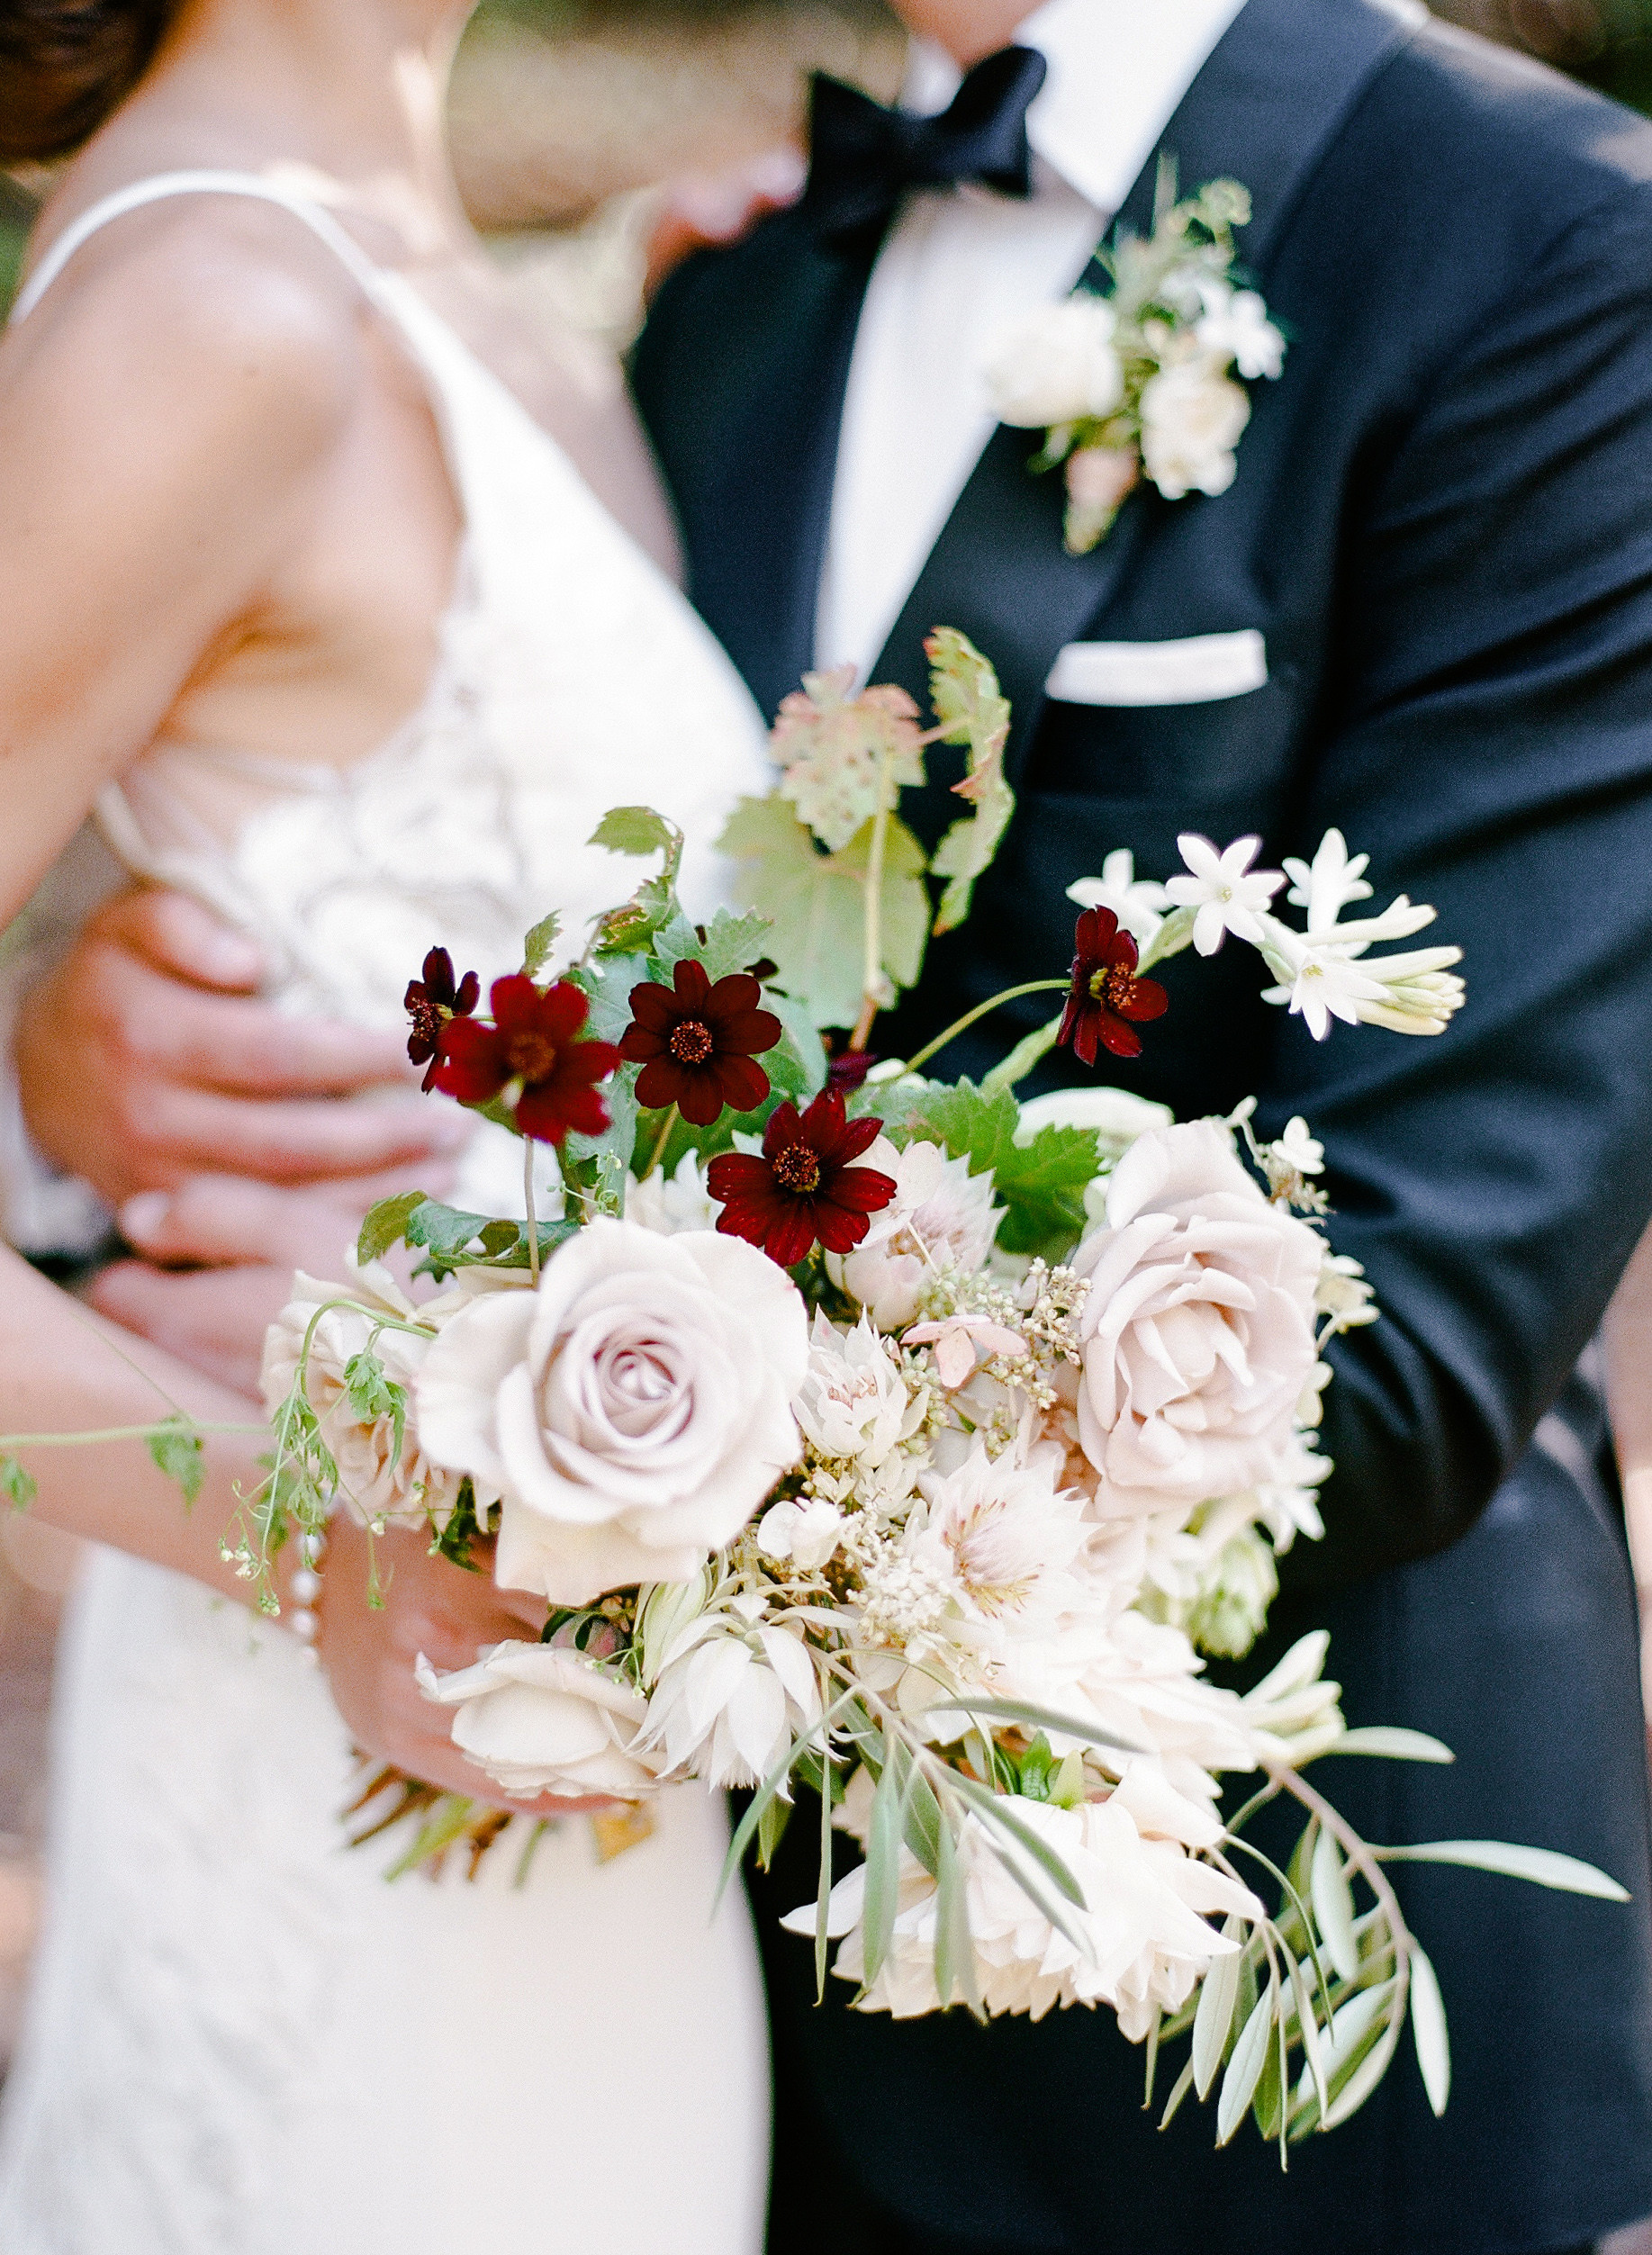 16de151d096 Our Favorite Floral Perfumes to Match Your Wedding Bouquet   Martha Stewart  Weddings